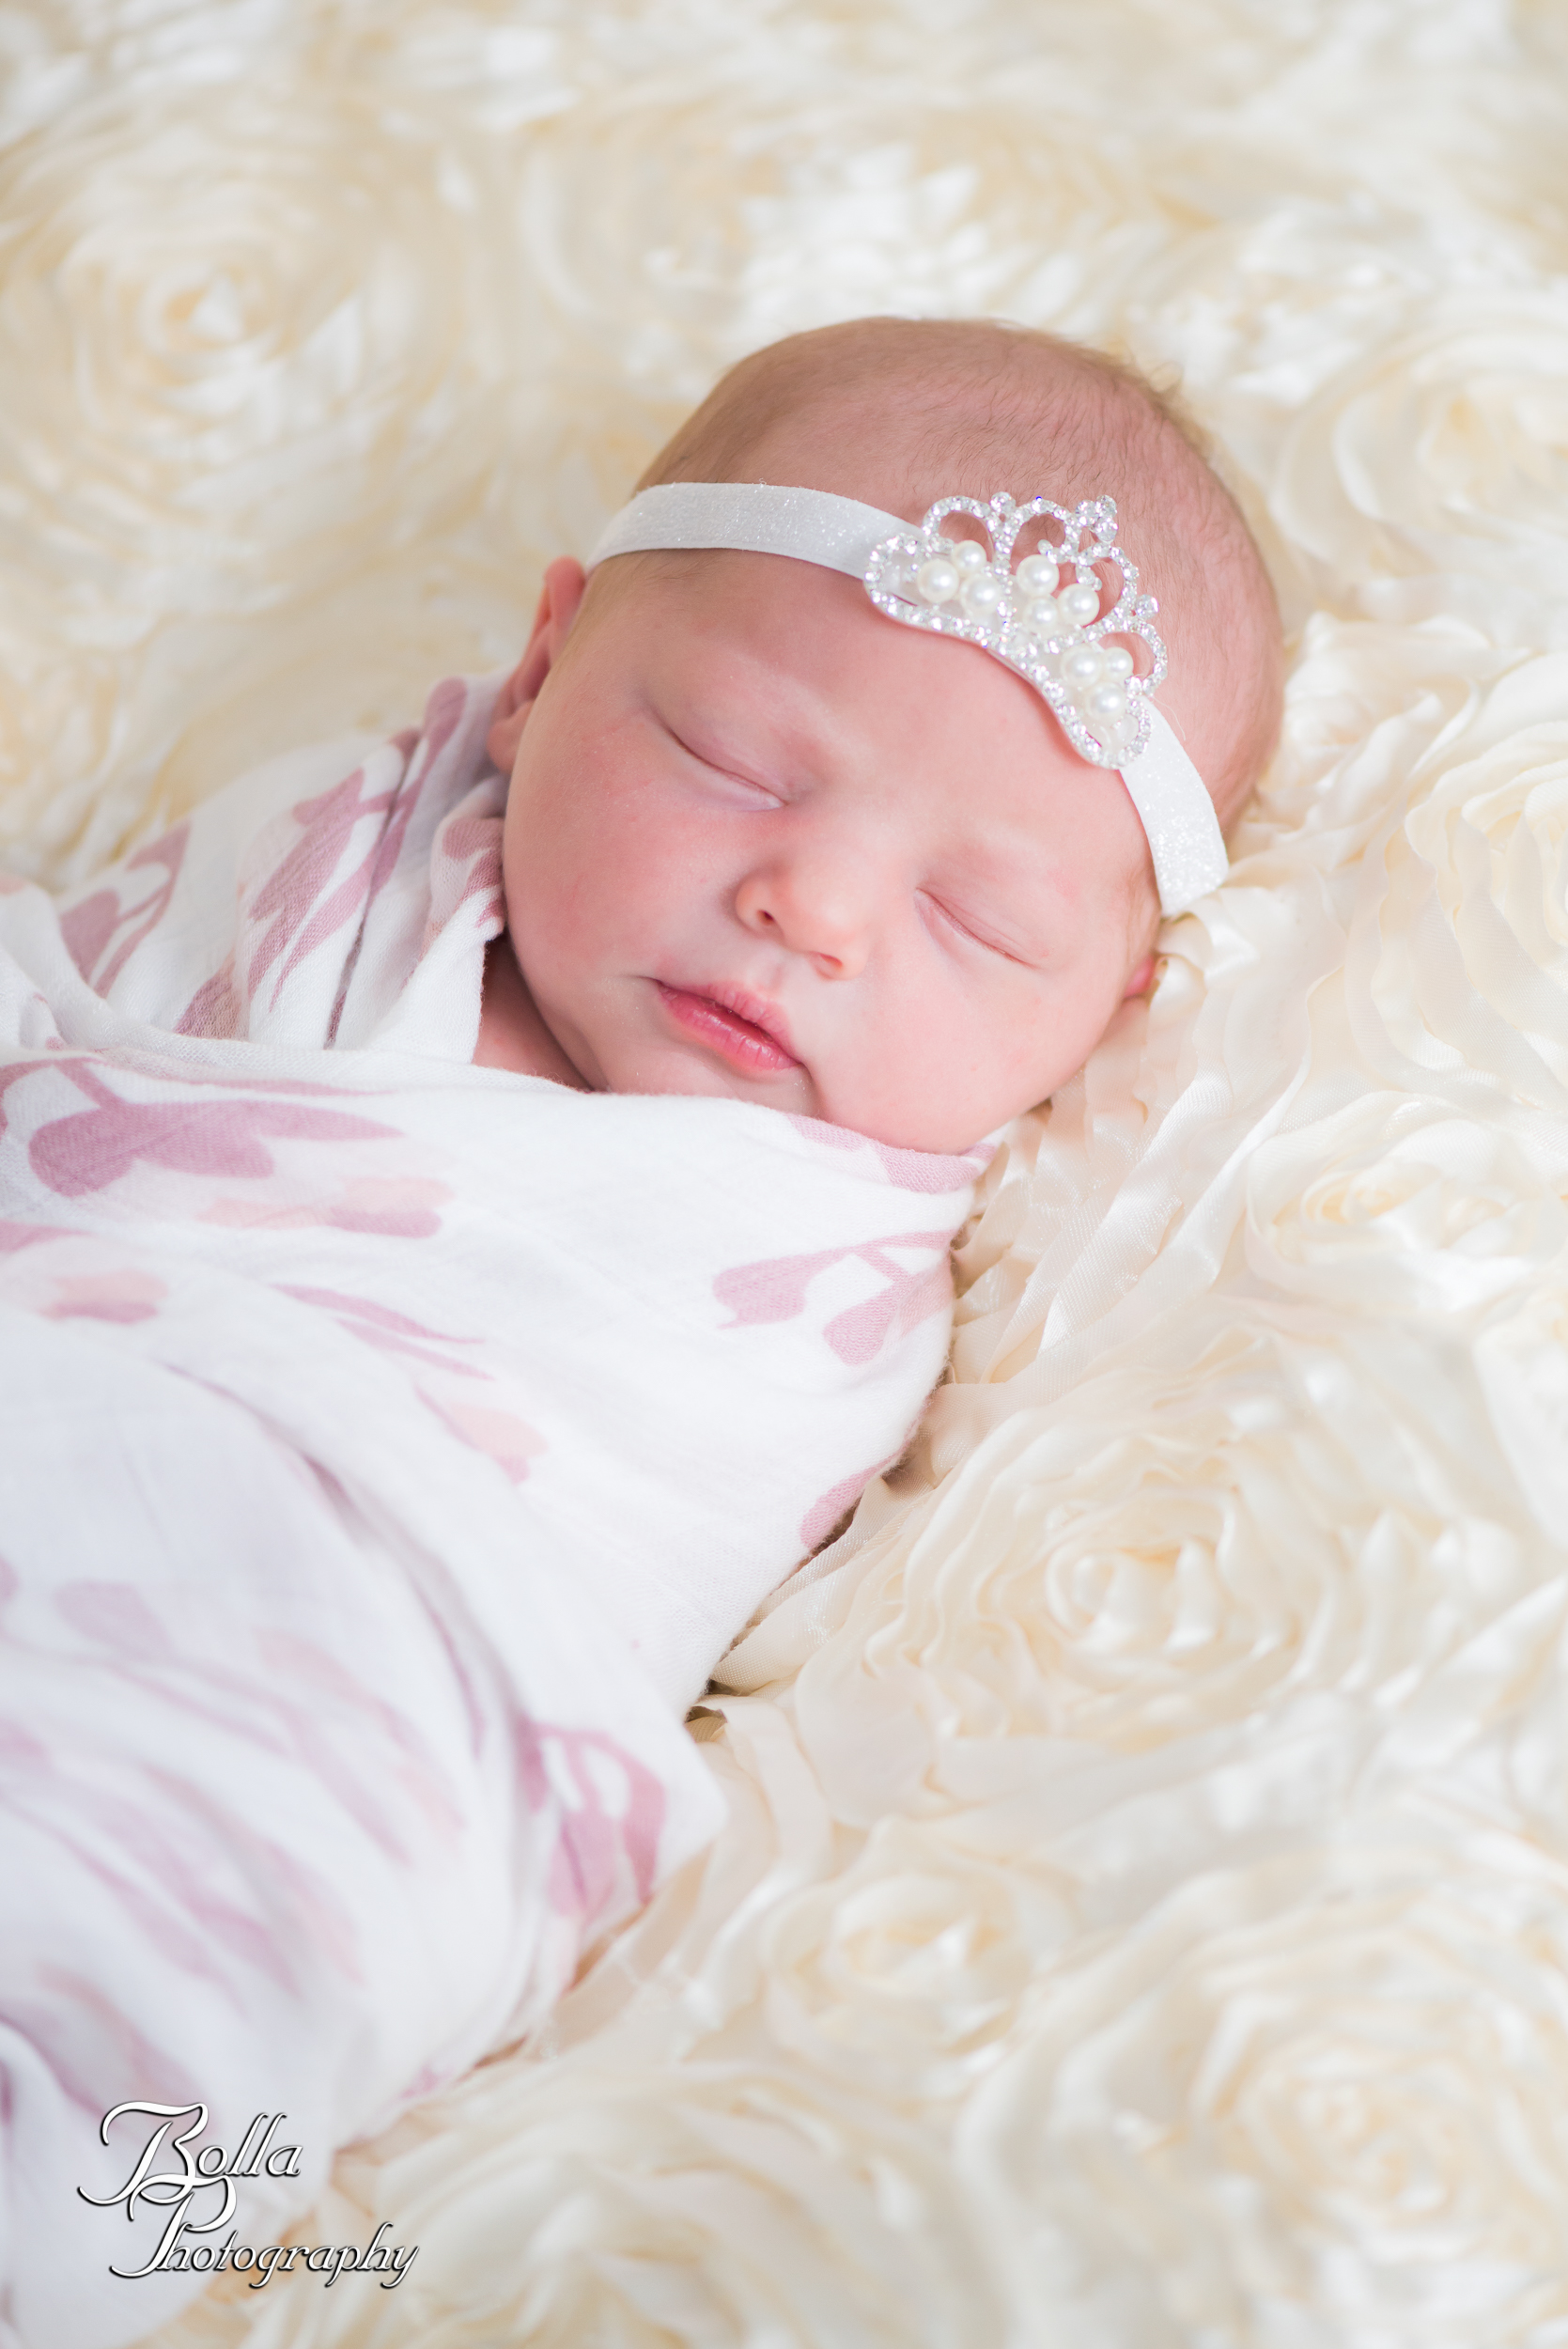 20170820_Bolla photography edwardsville wedding newborn photographer st louis weddings babies-0001.jpg